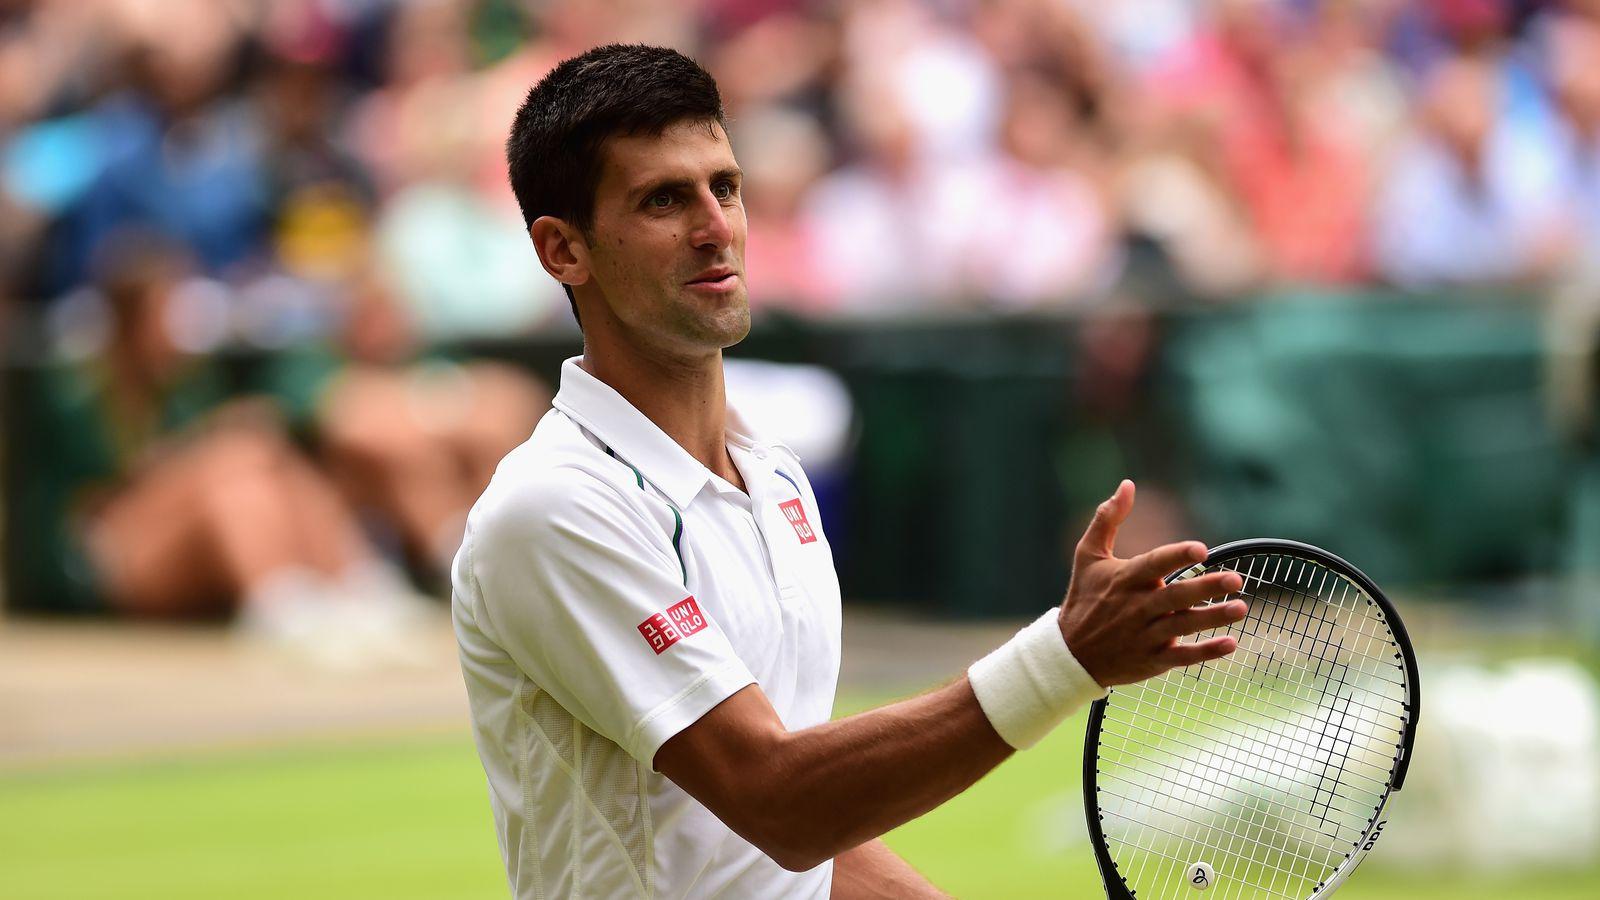 Novak Djokovic wins 2015 Wimbledon men's title - SBNation.com